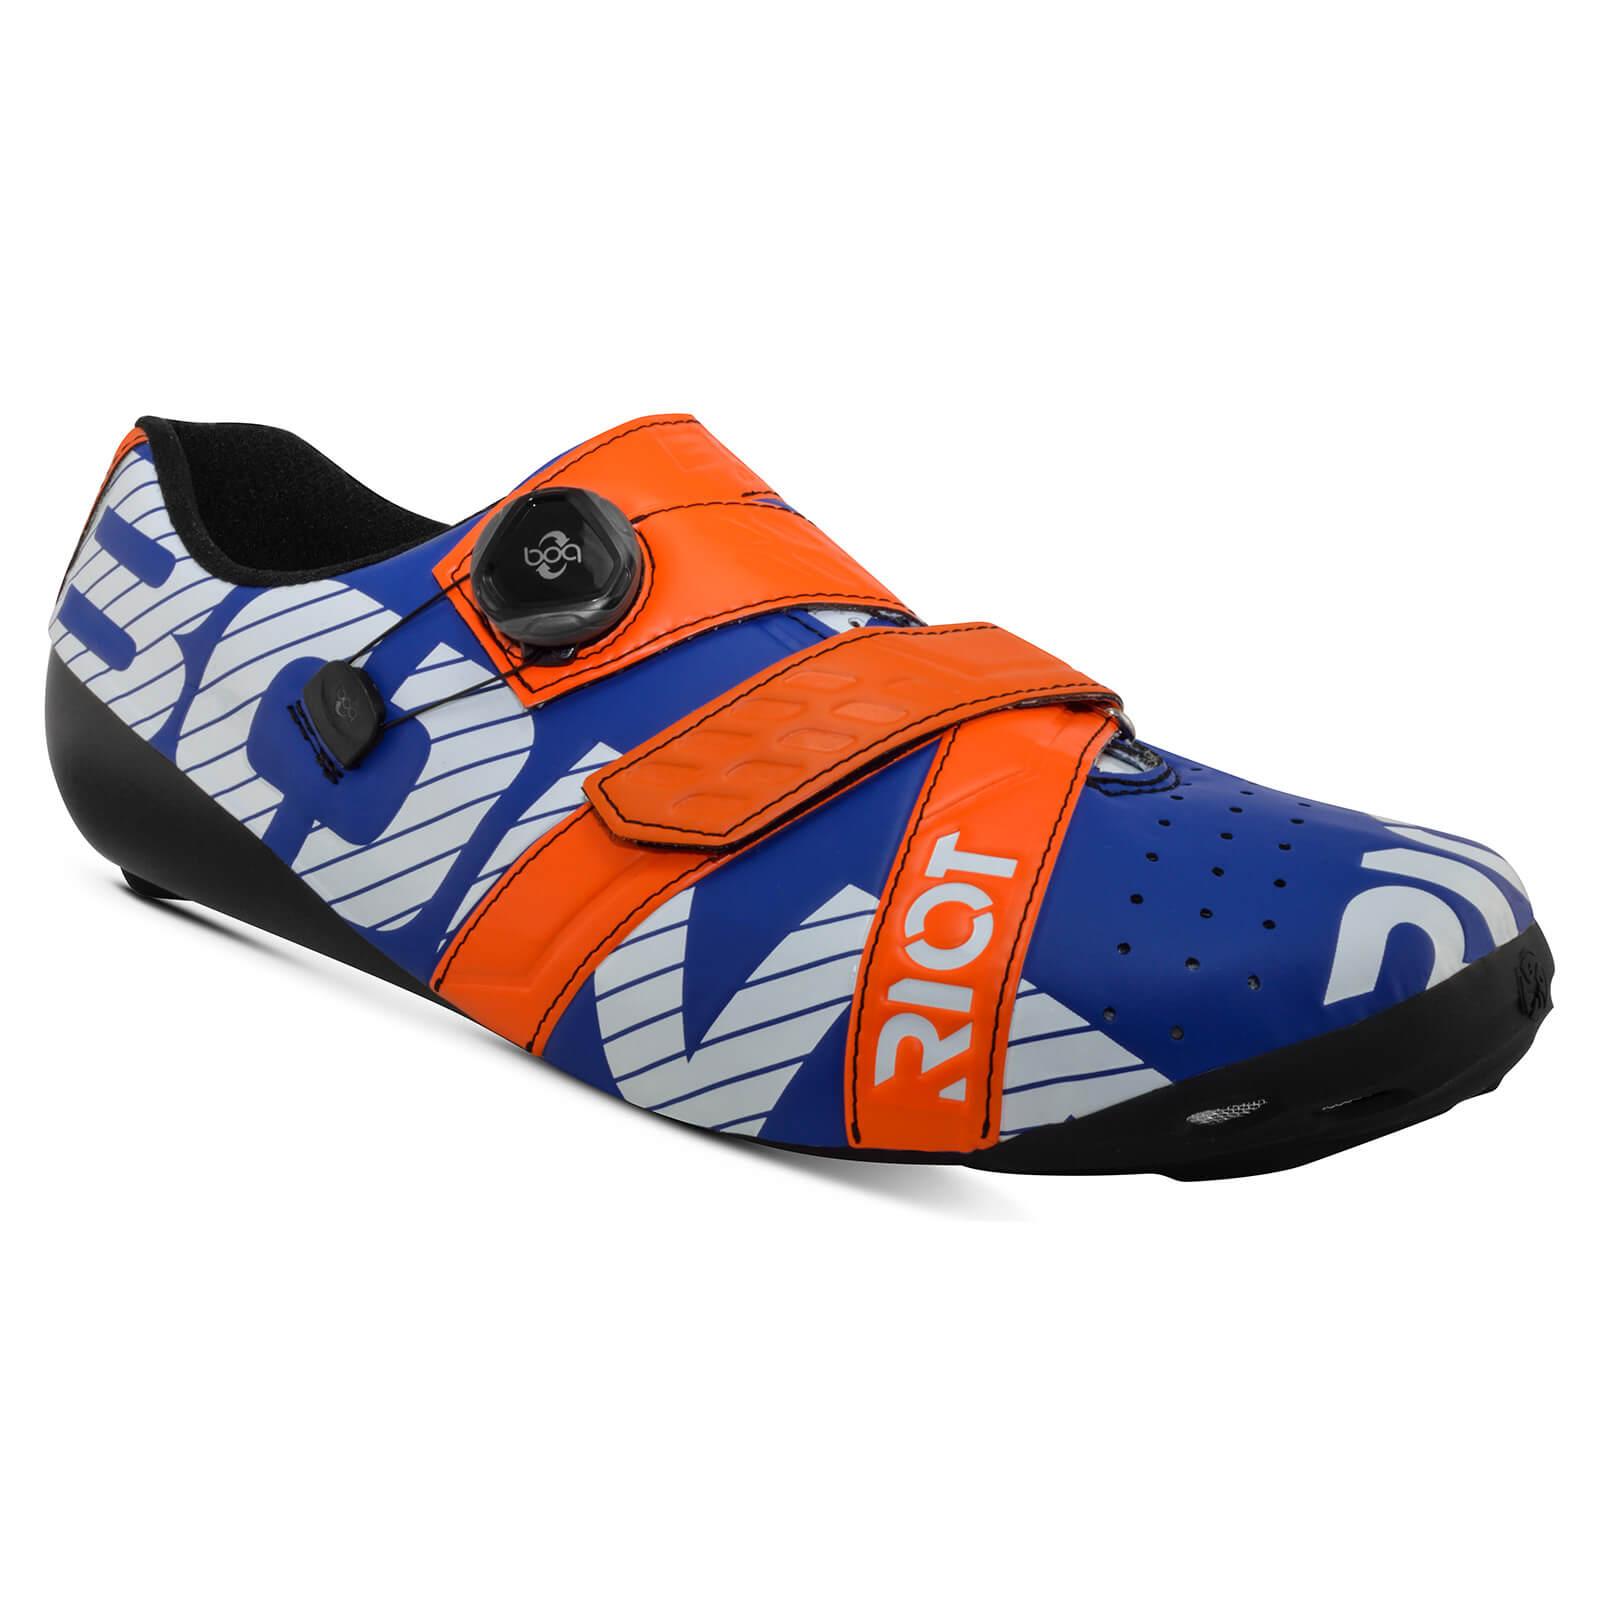 Bont Riot+ Road Shoes - EU 40 - Blue/Red